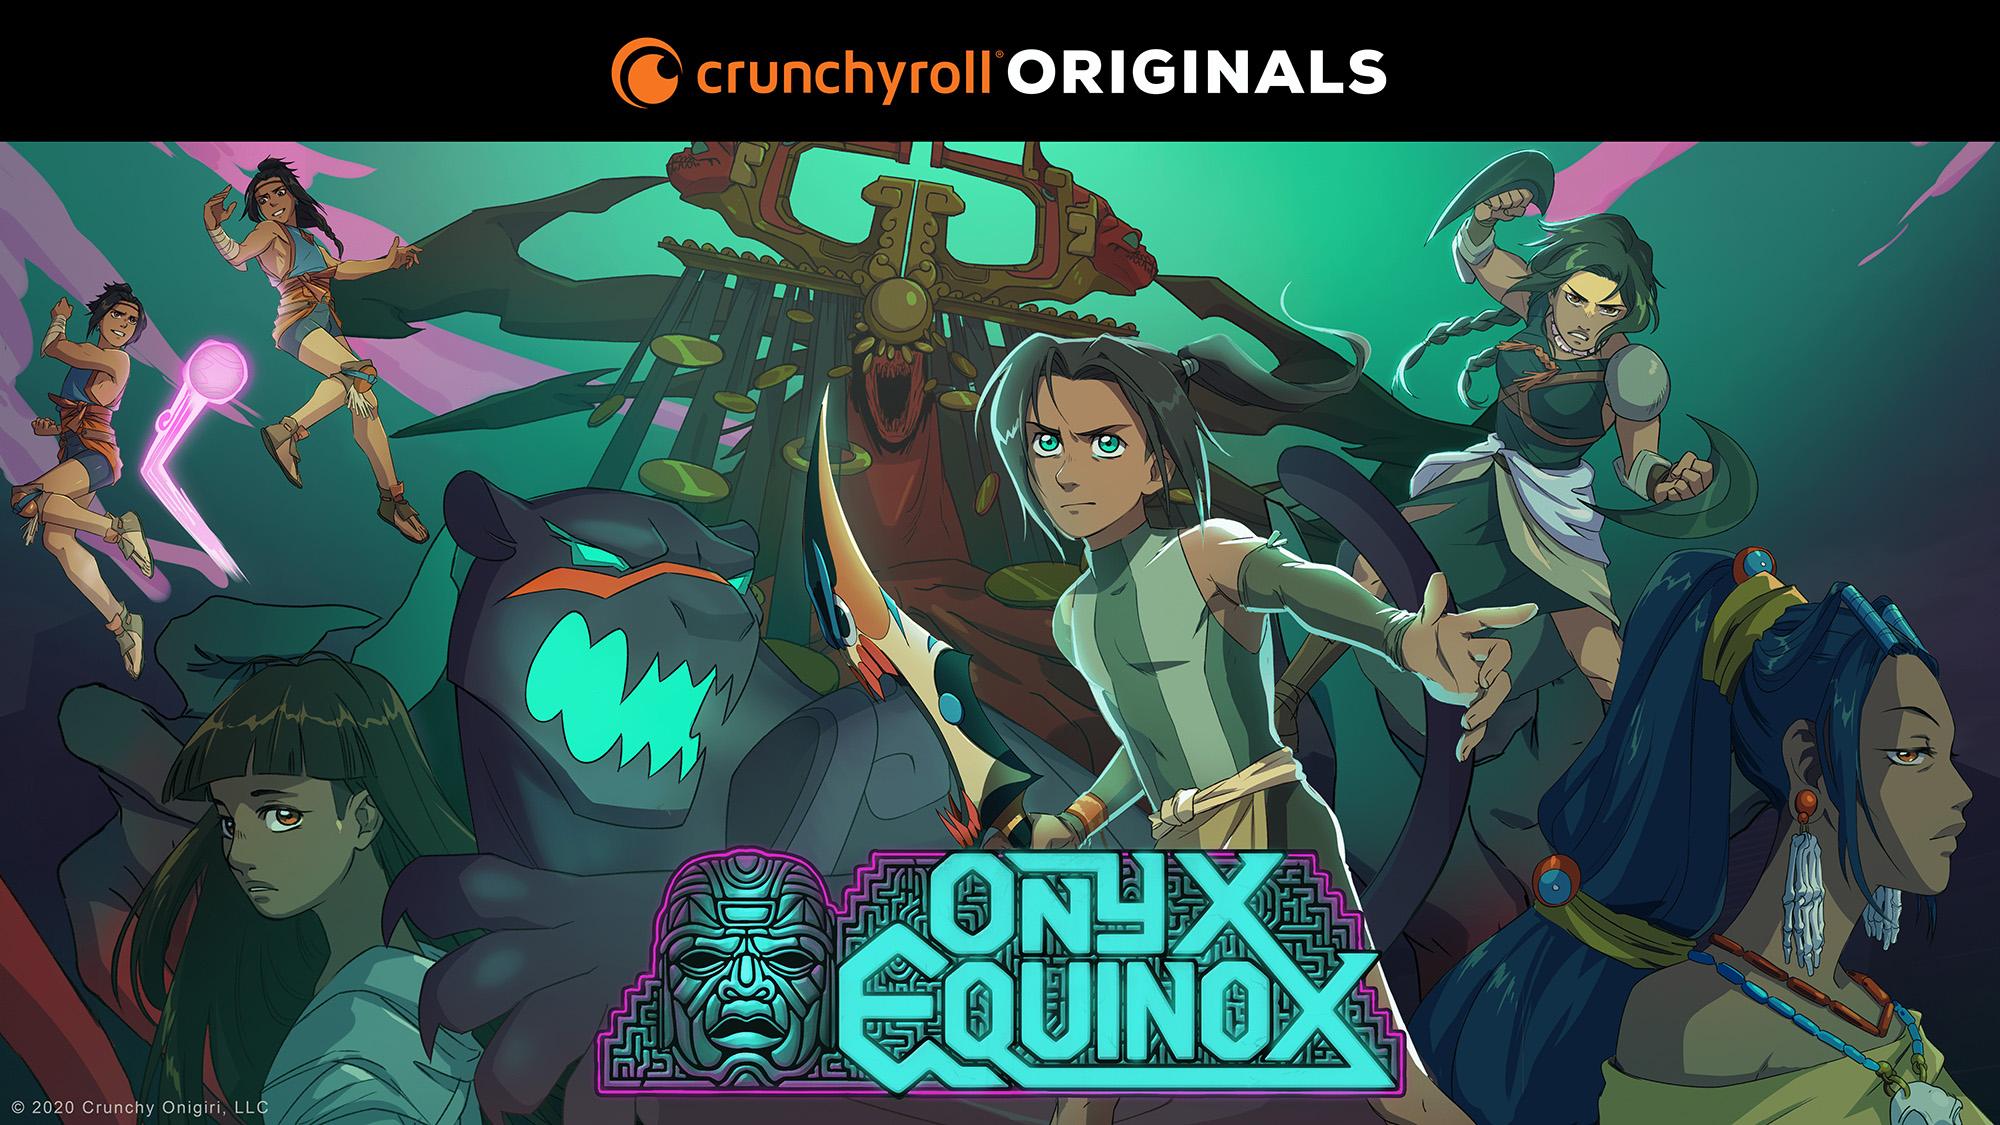 Onyx Equinox - Crunchyroll